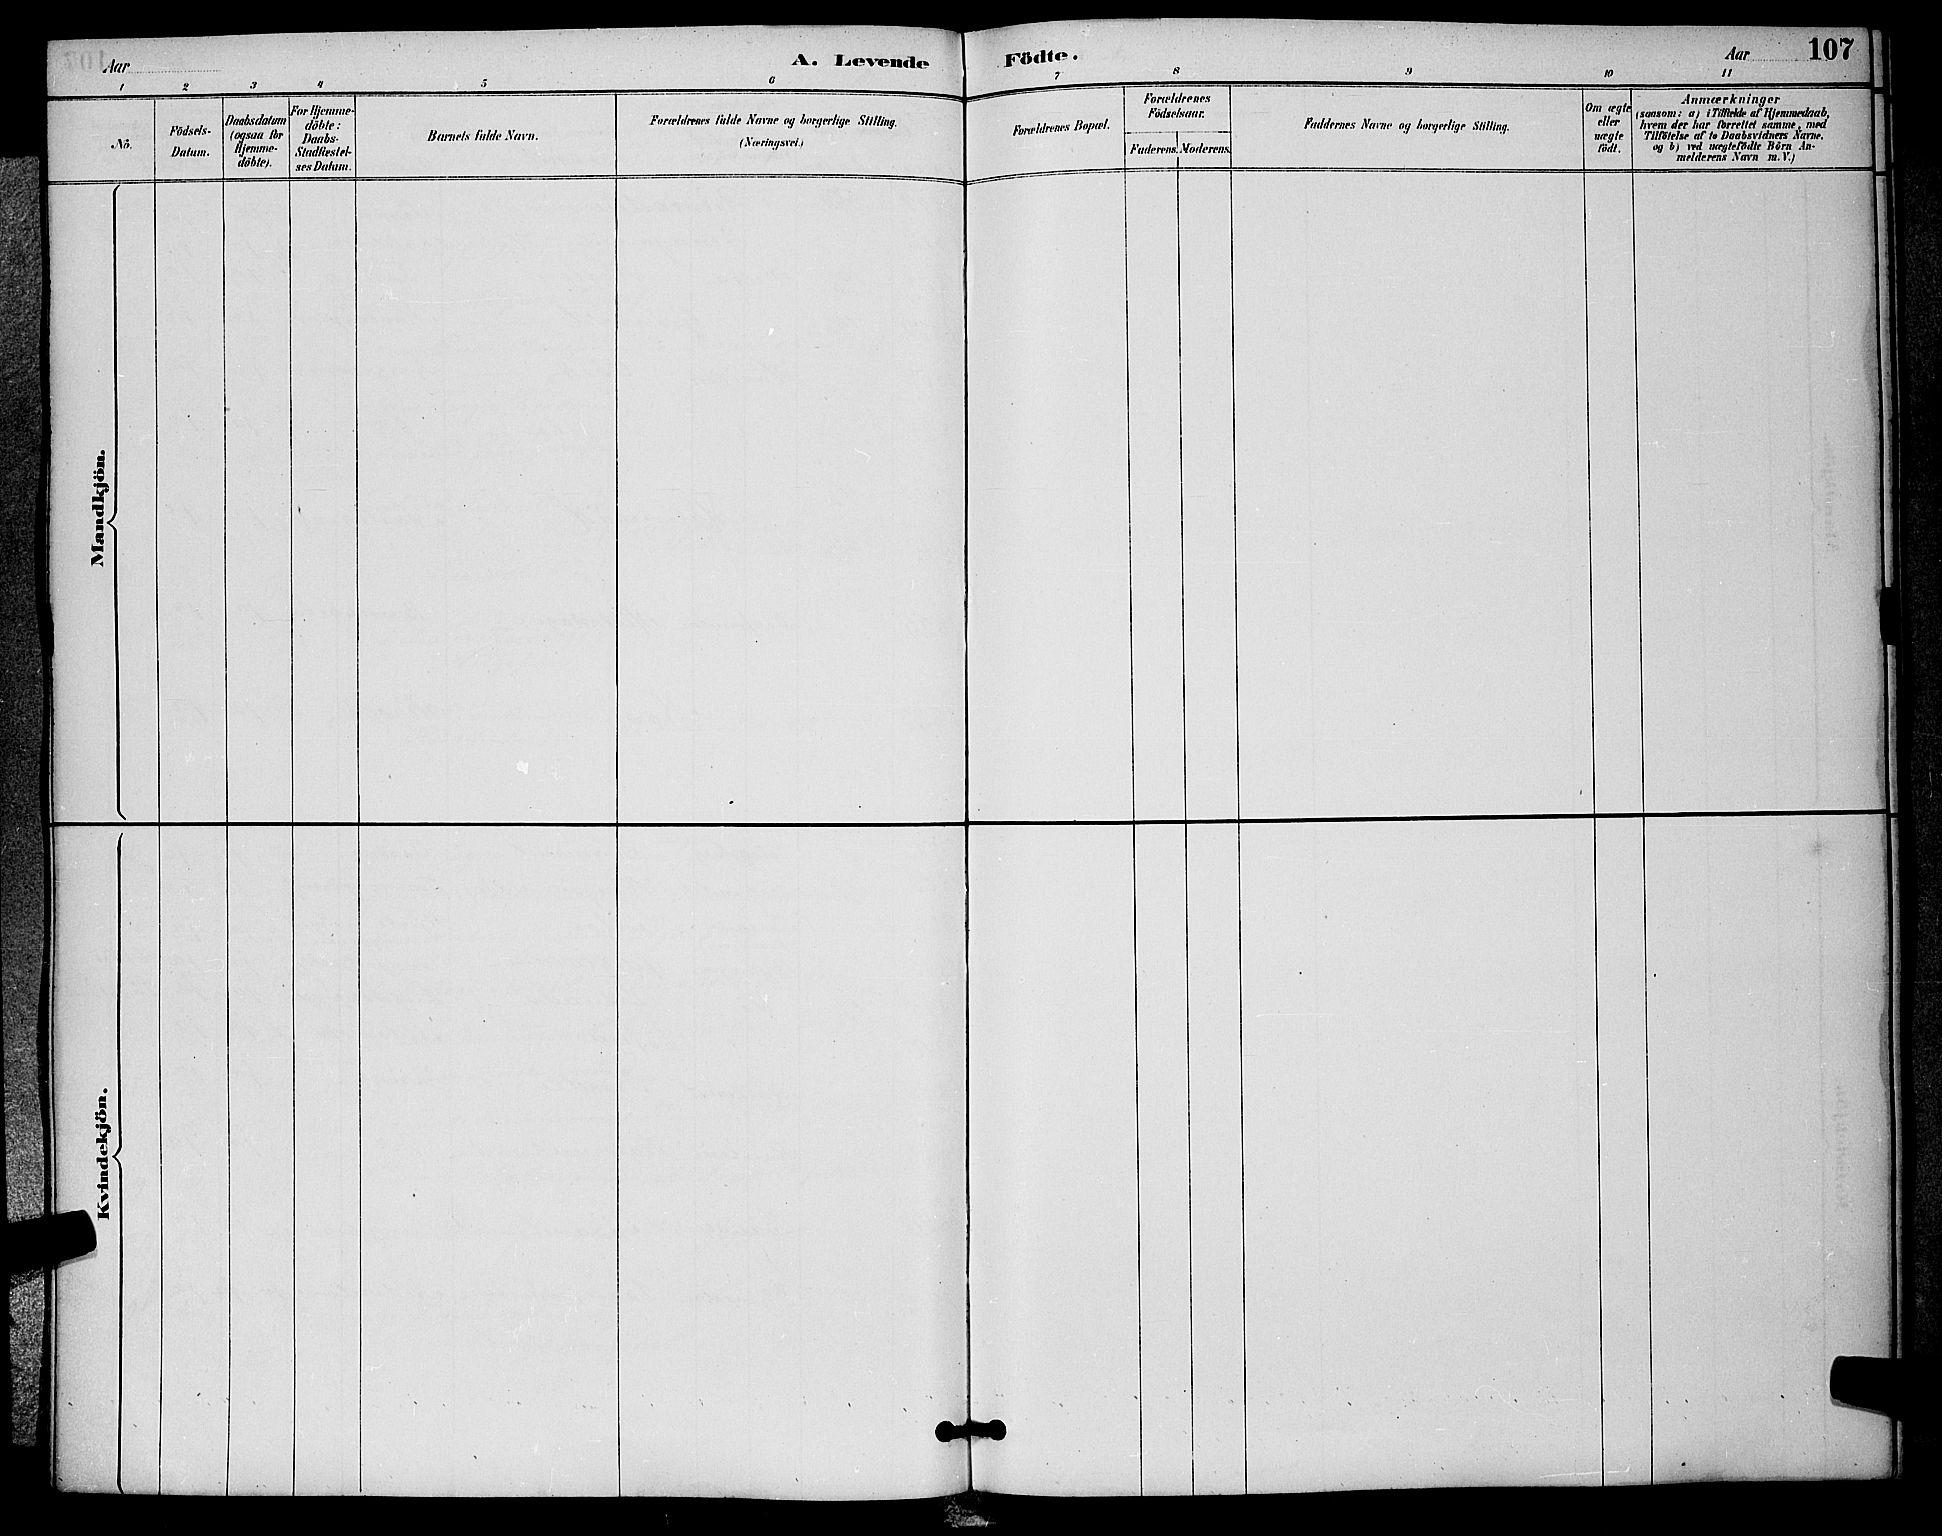 SAKO, Sigdal kirkebøker, G/Ga/L0005: Klokkerbok nr. I 5, 1886-1900, s. 107